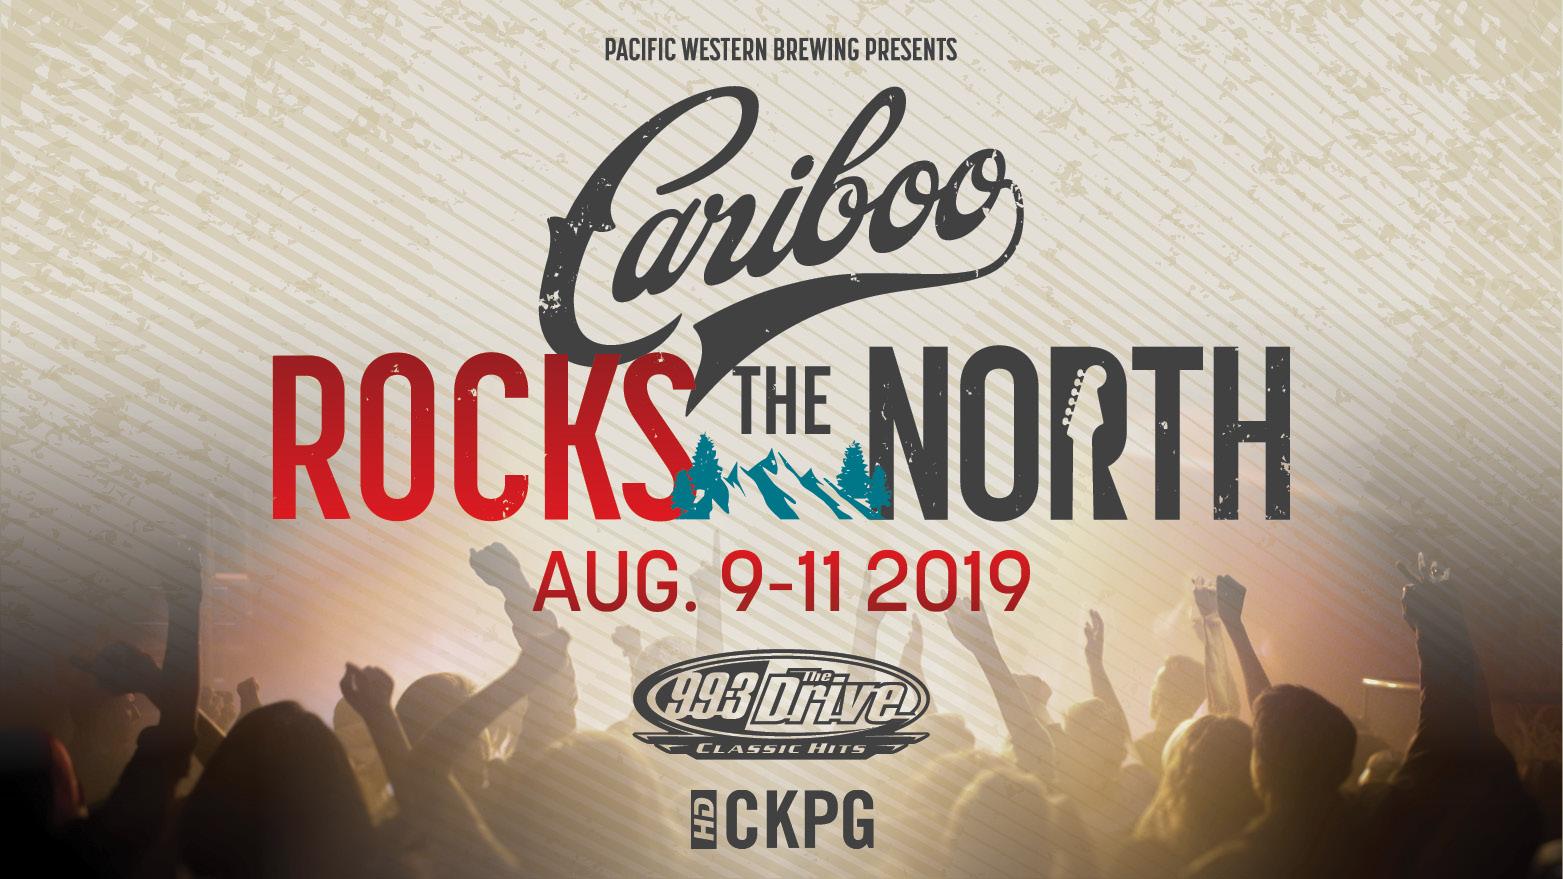 99.3 The Drive Presents: Cariboo Rocks the North